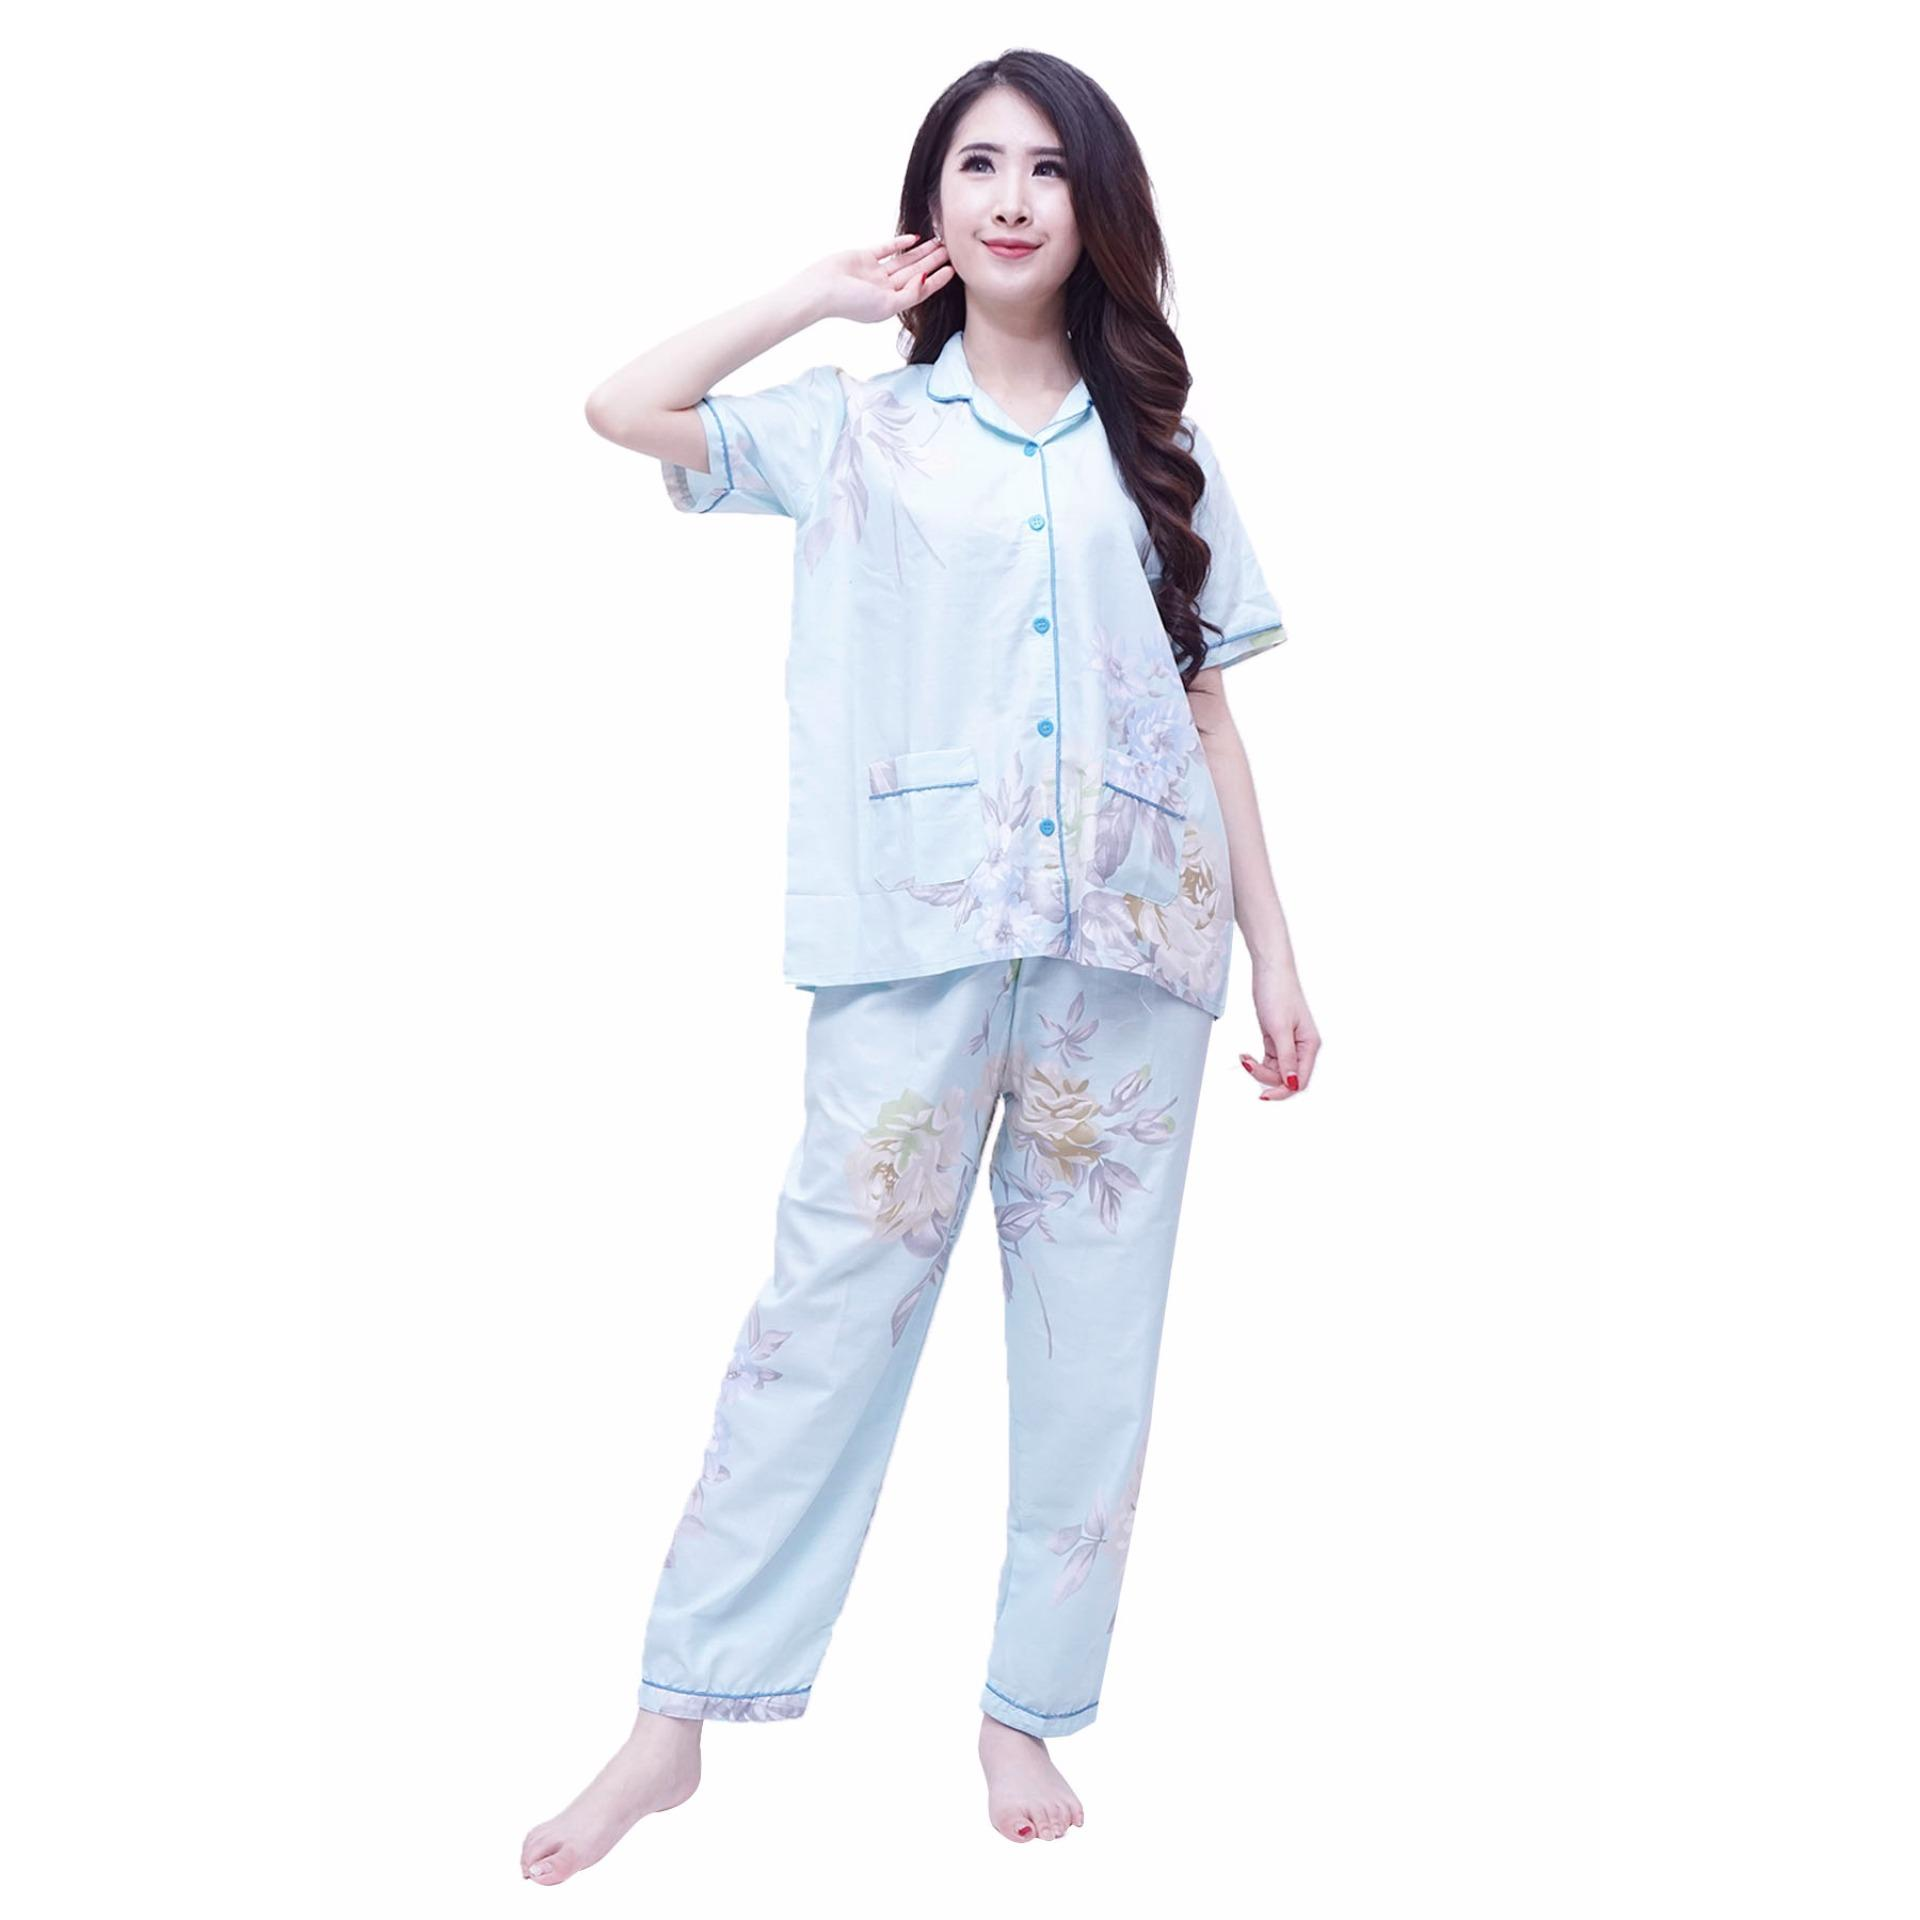 Tips Beli Quincy Baju Tidur Gretha Piyama Celana Panjang Tosca Yang Bagus